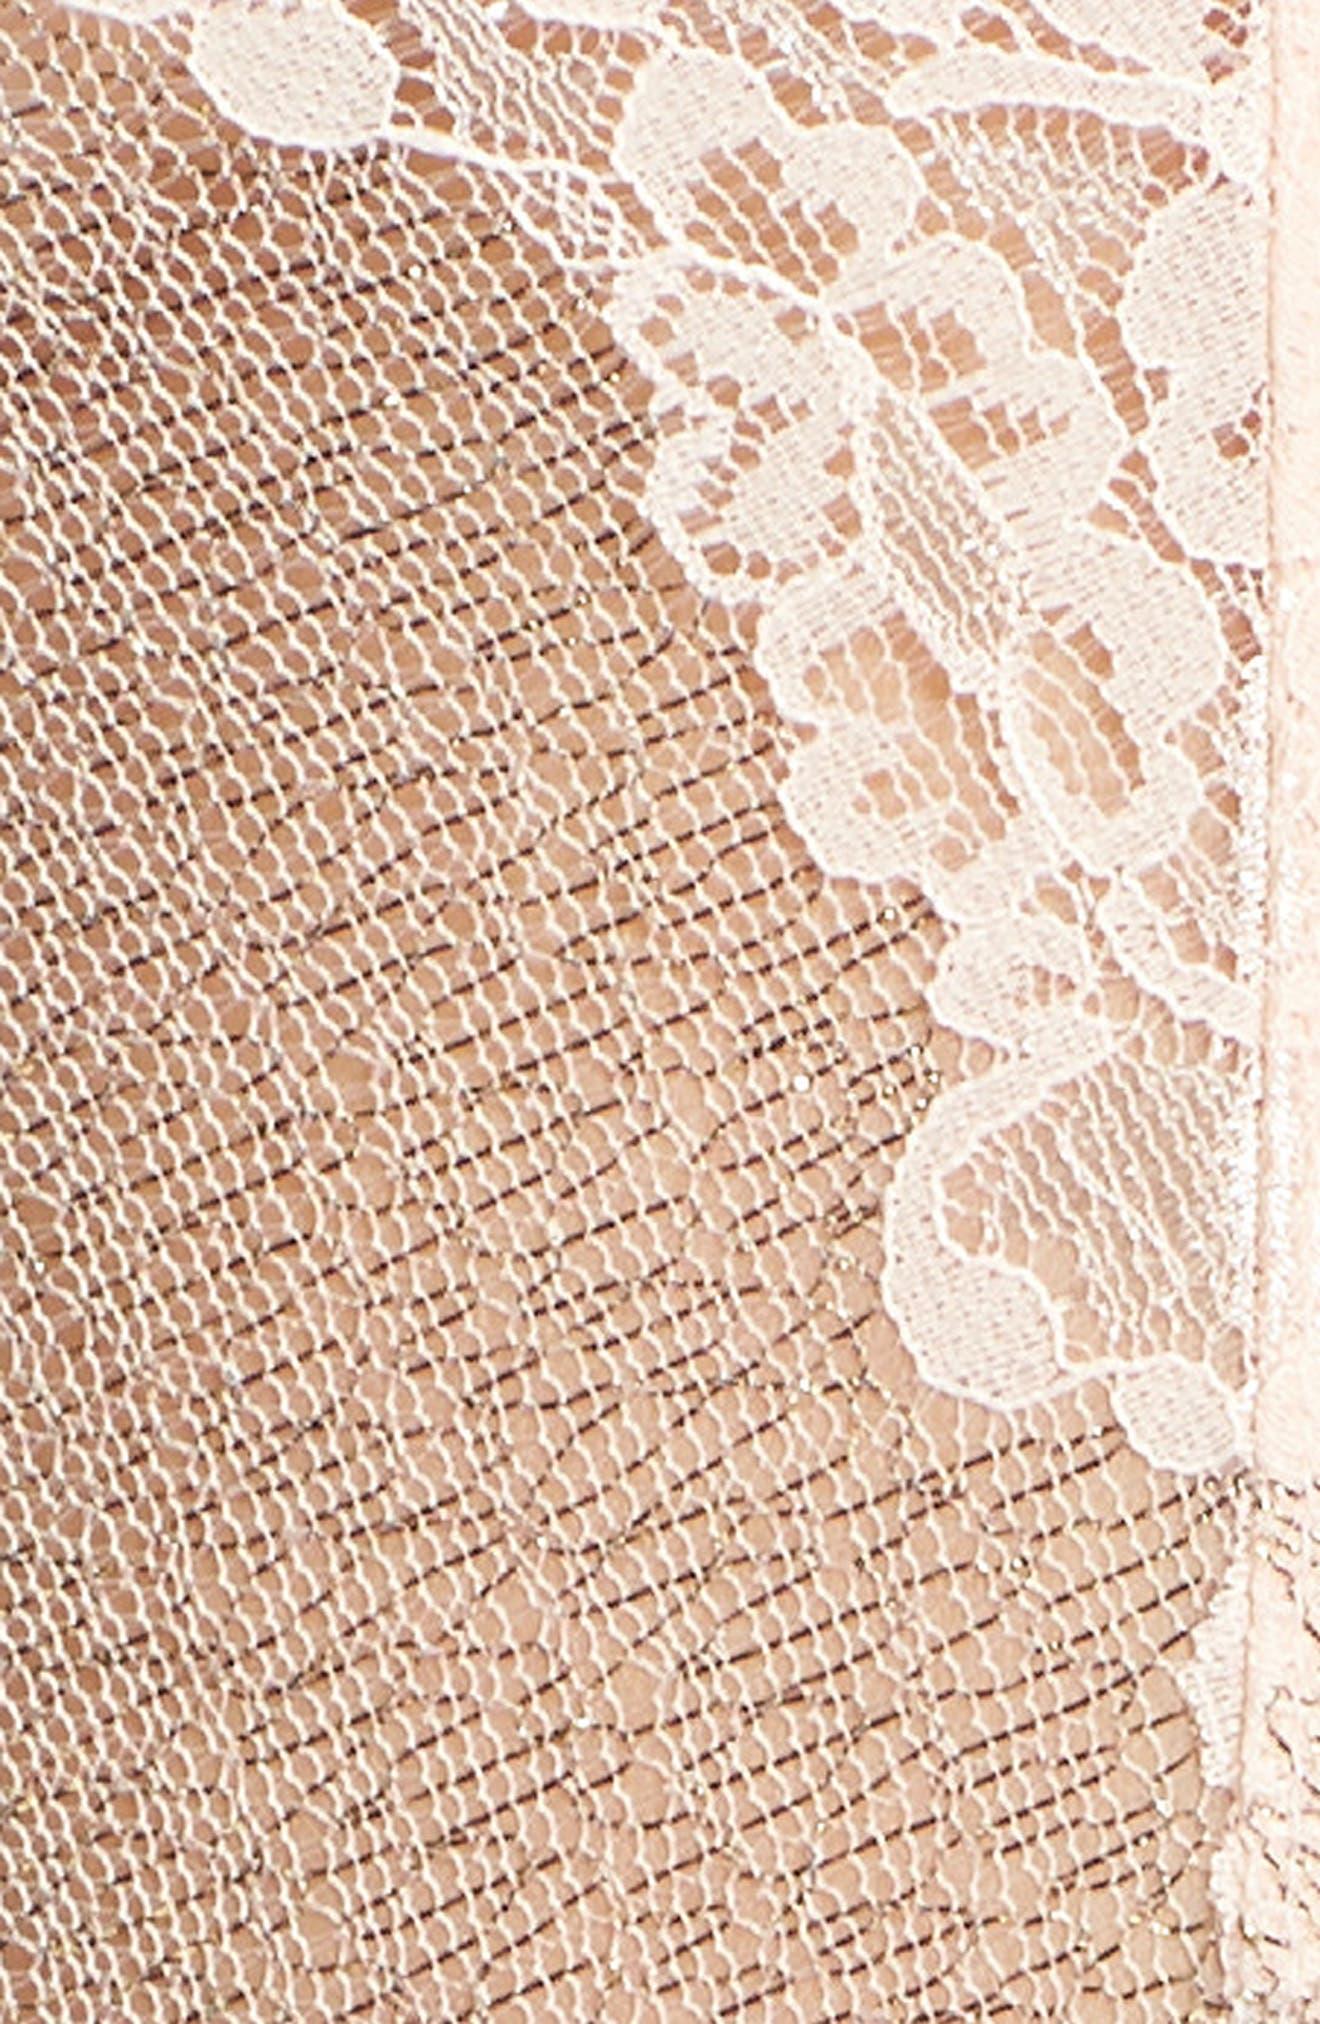 HANKY PANKY,                             Creme de la Creme Bodysuit,                             Alternate thumbnail 5, color,                             VANILLA